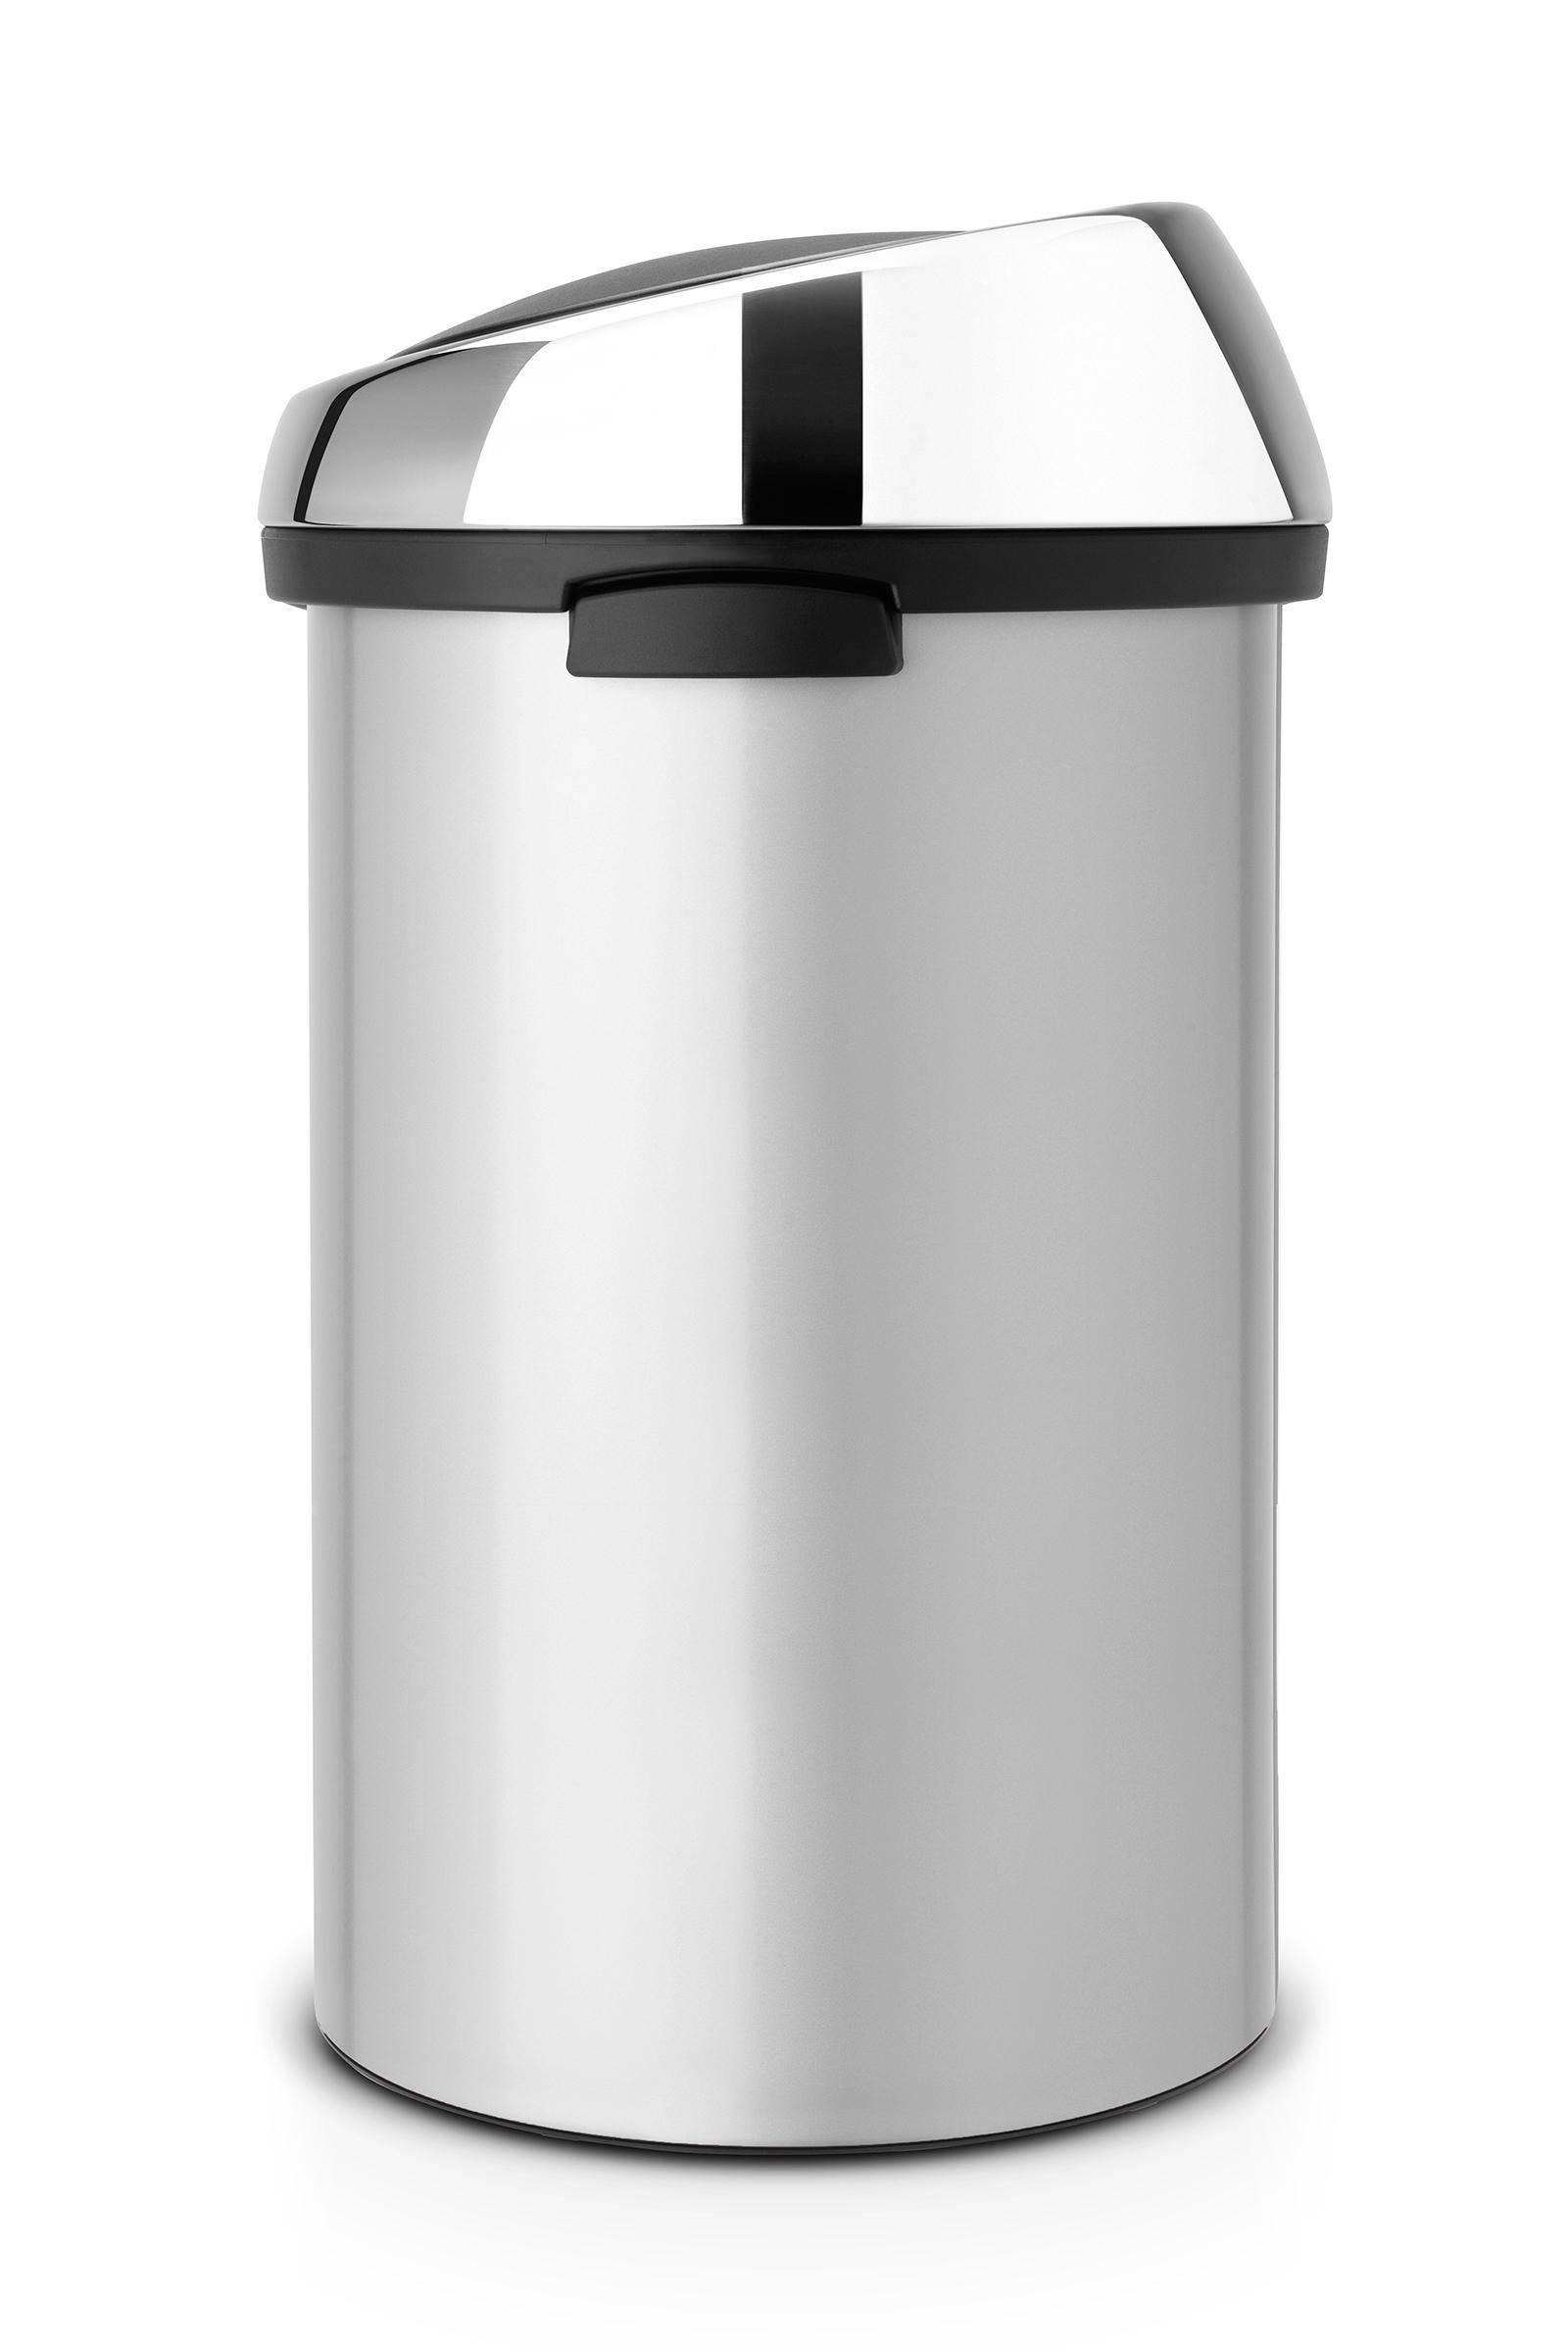 Brabantia Afvalemmer Touch Bin 50 Liter.Touch Bin 50 Liter Prullenbak